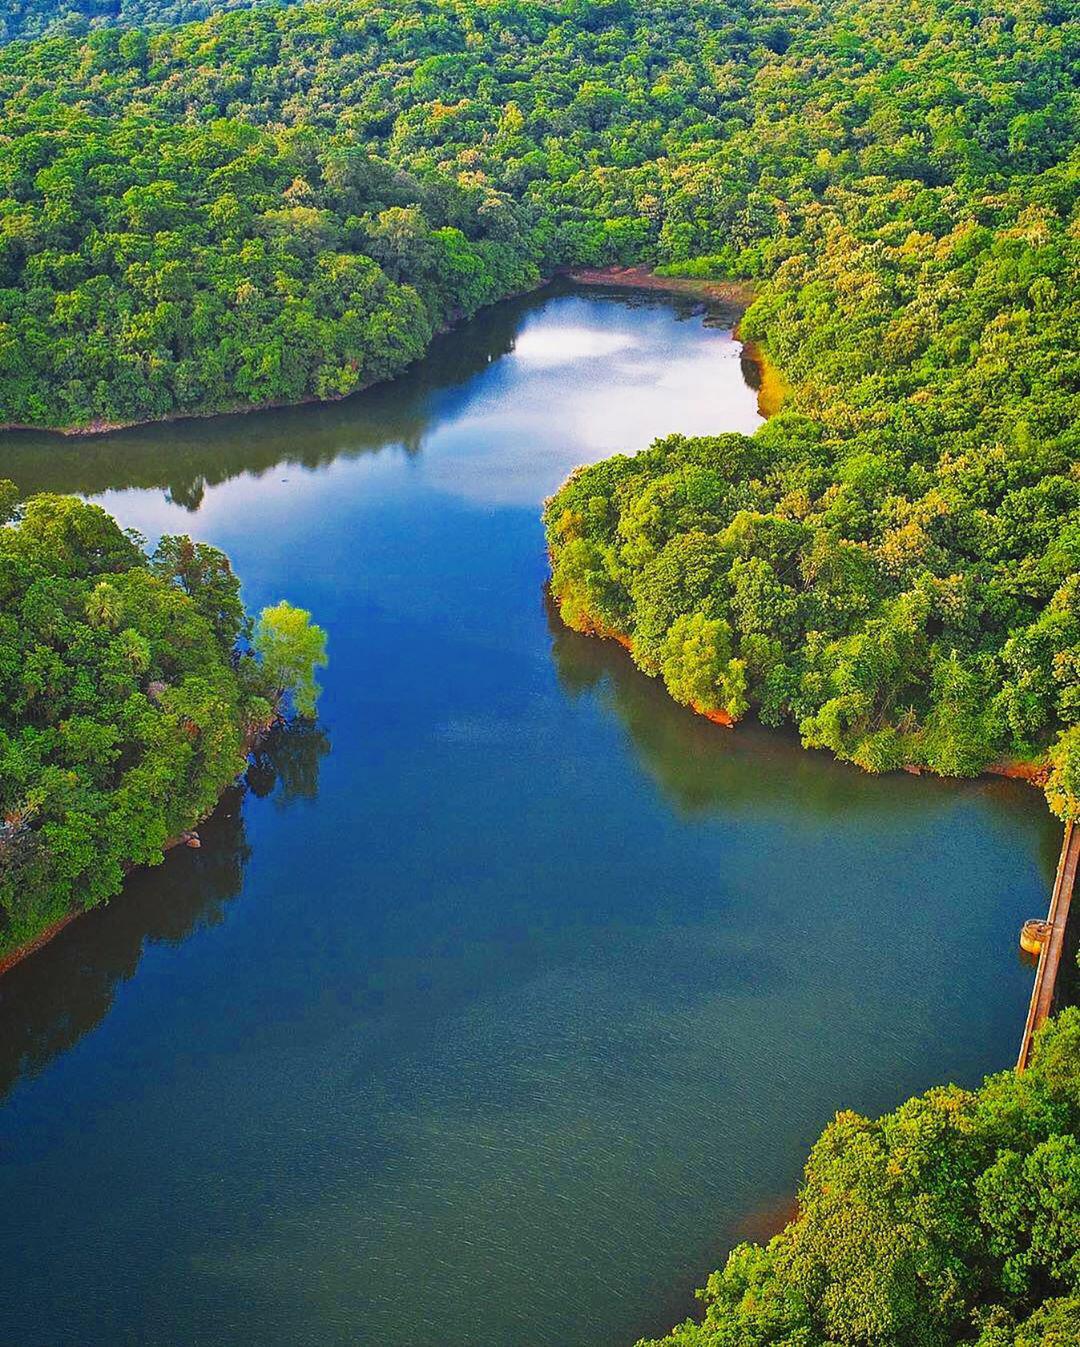 asurankundu waterfalls